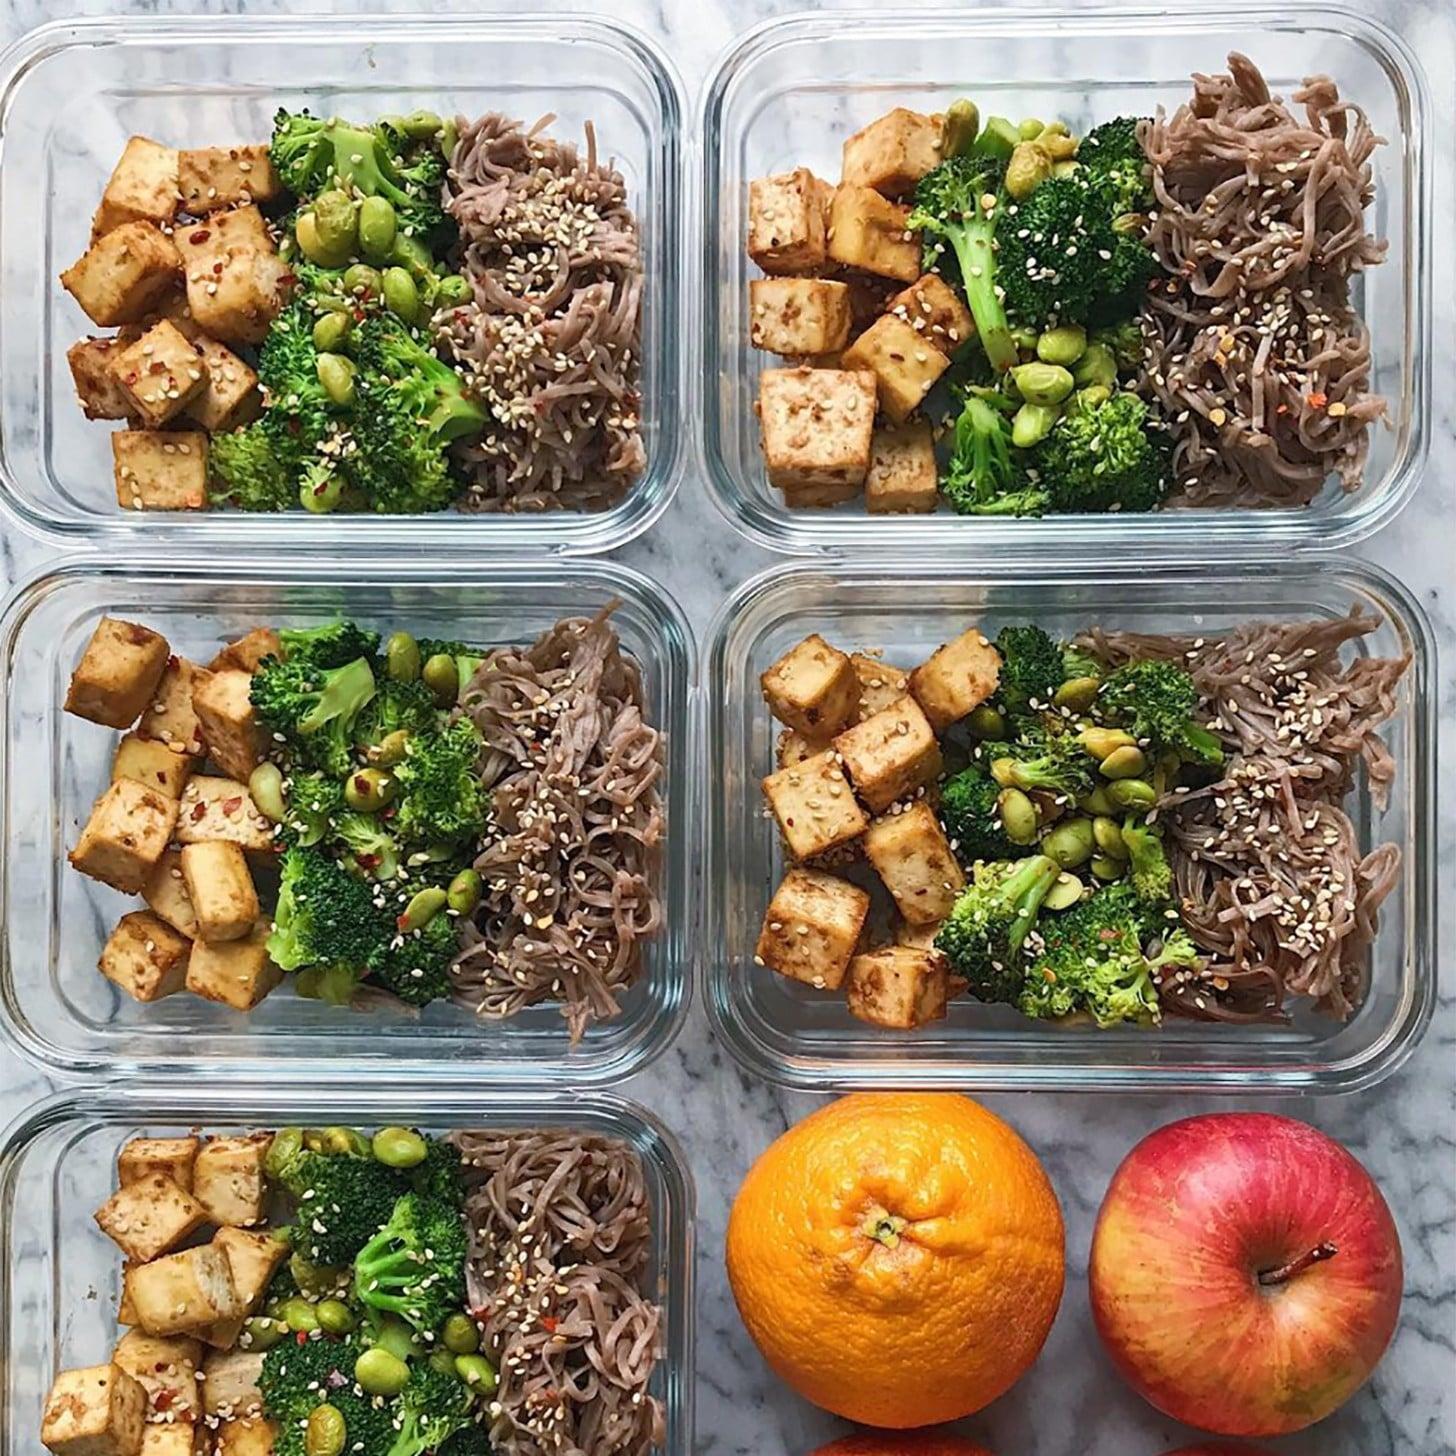 Lunch Meal Prep Ideas   POPSUGAR Fitness